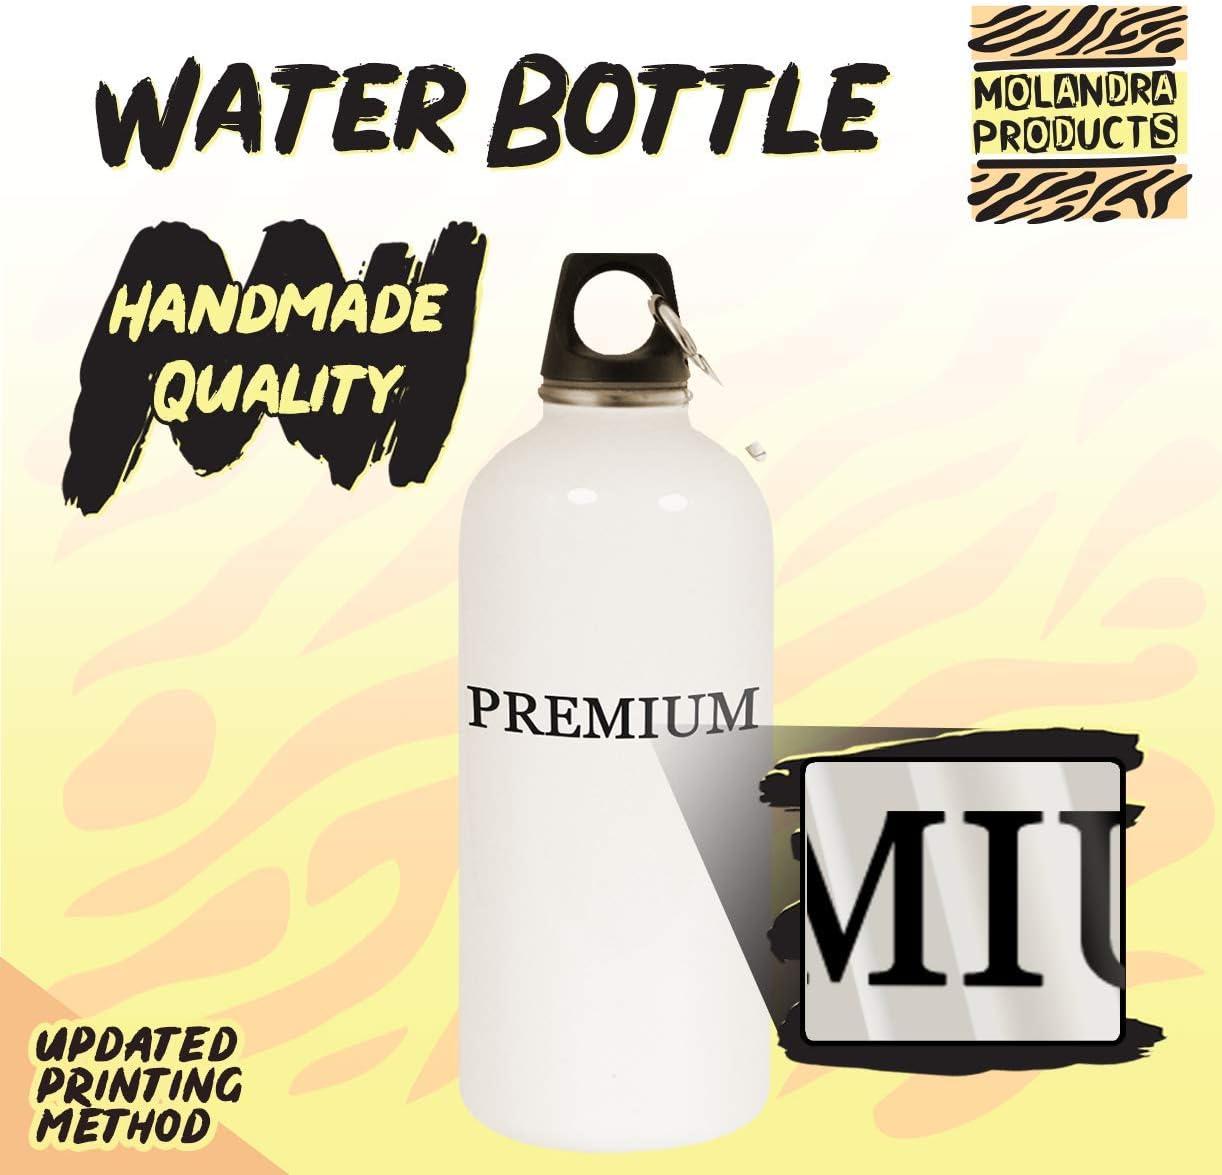 got brant? - 20oz Stainless Steel White Water Bottle with Carabiner, White 51yDrH4vhWL